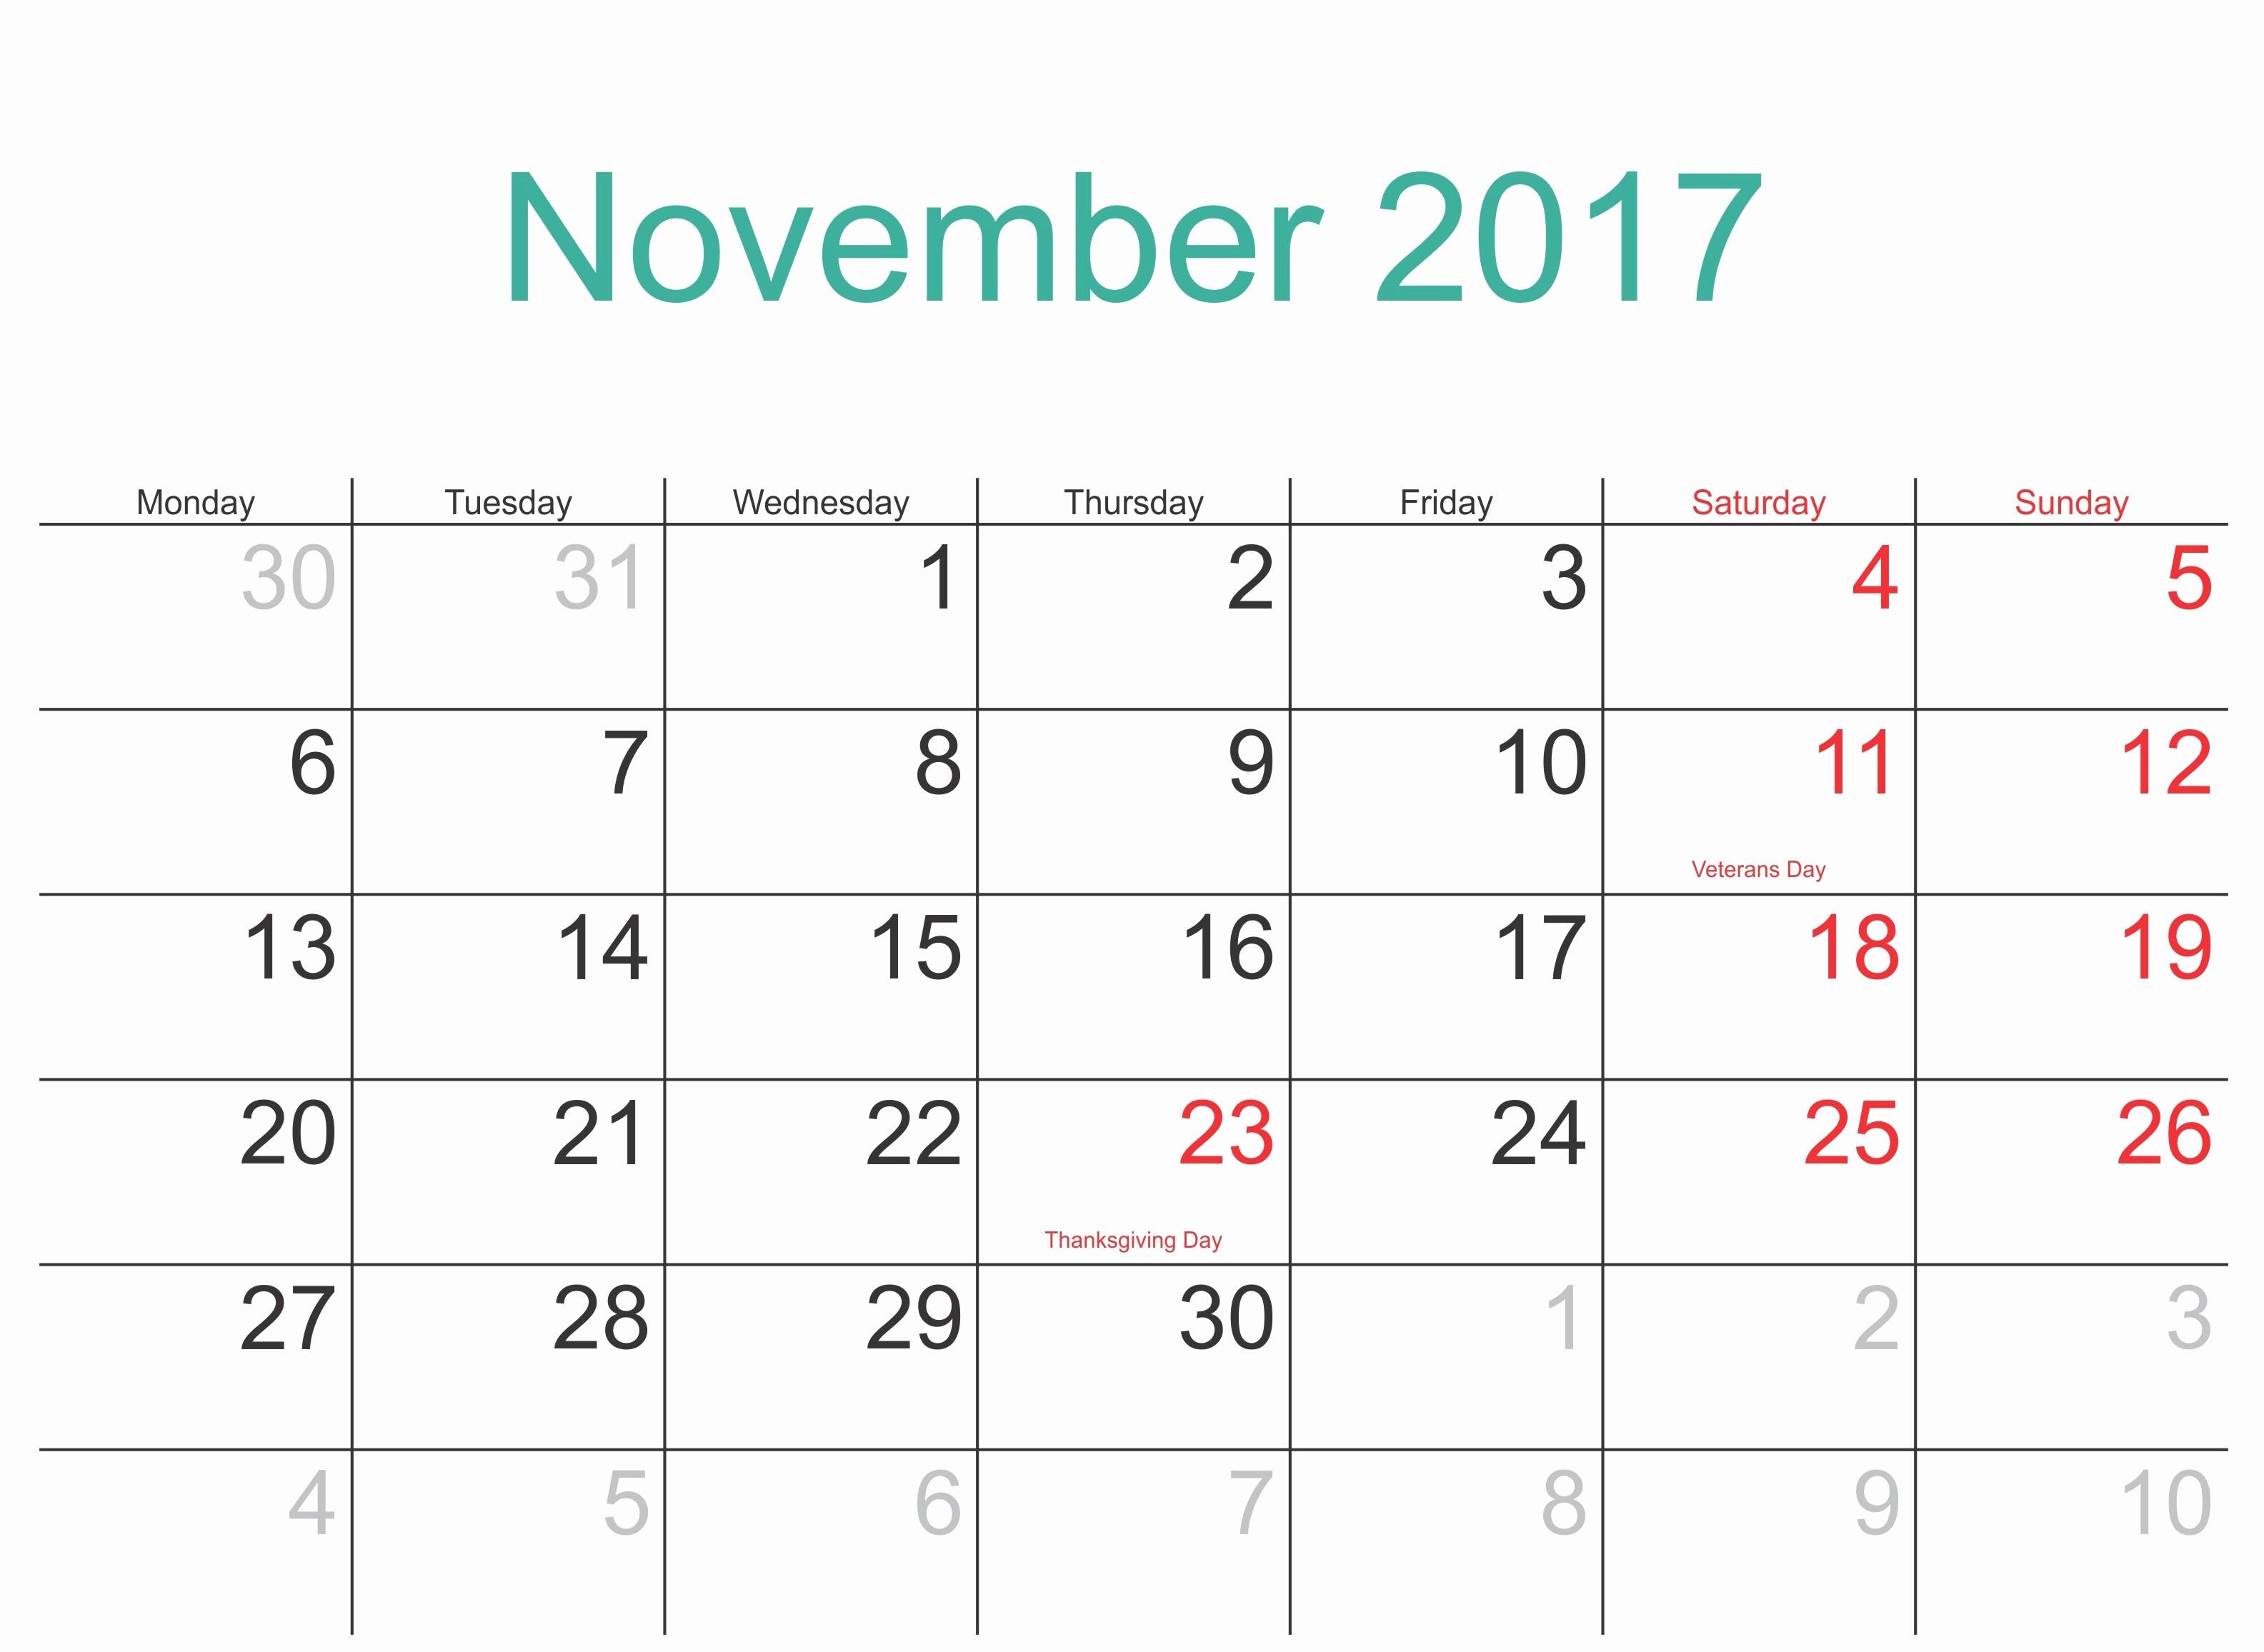 2017 Calendar Template Word Document Lovely November 2017 Printable Calendar Template Holidays Excel